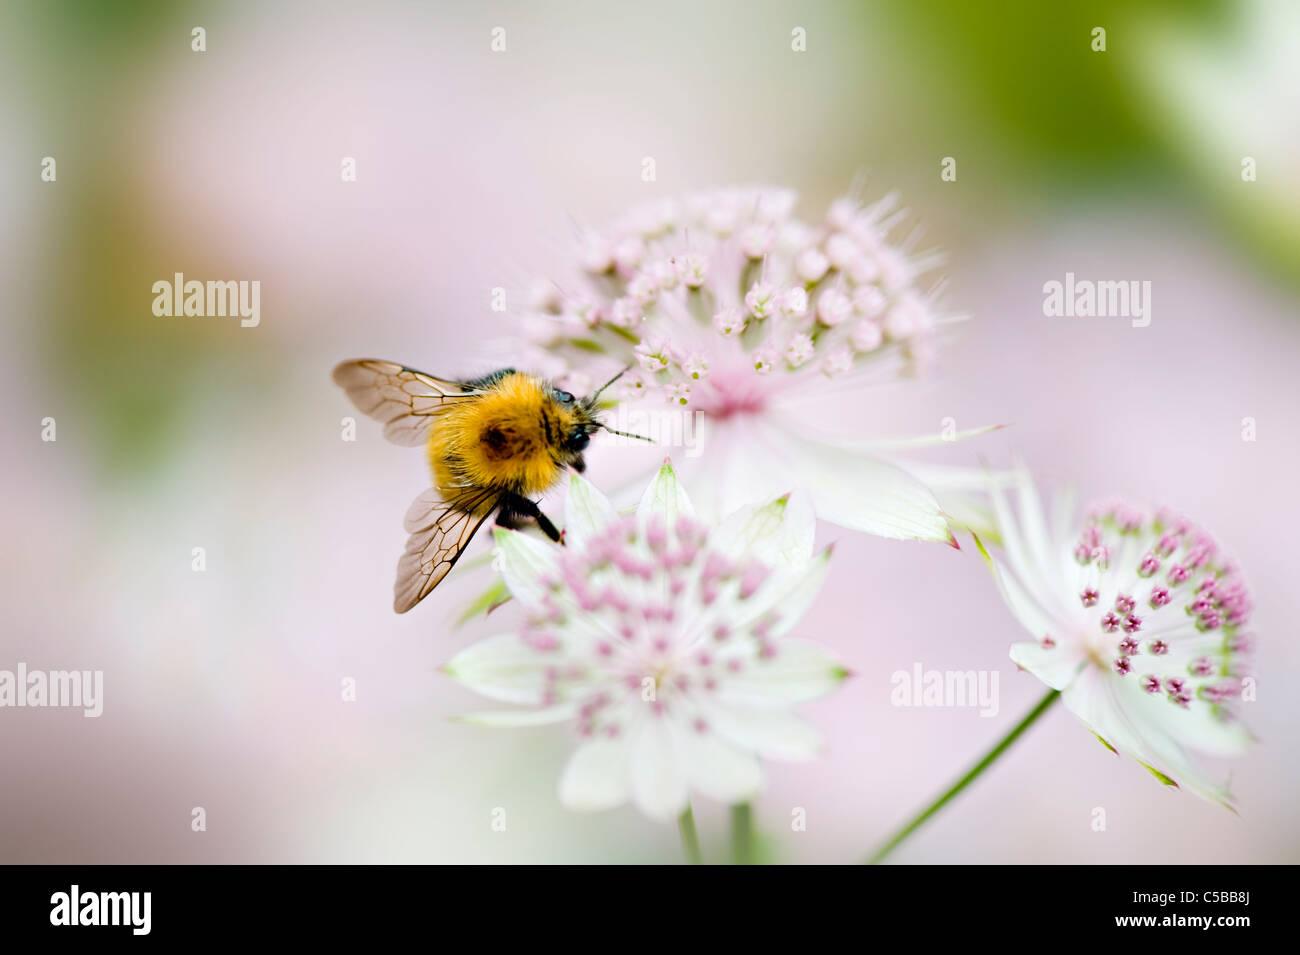 A european Honeybee  - Apis mellifera collecting pollen from and Astrantia flower -masterwort - Stock Image